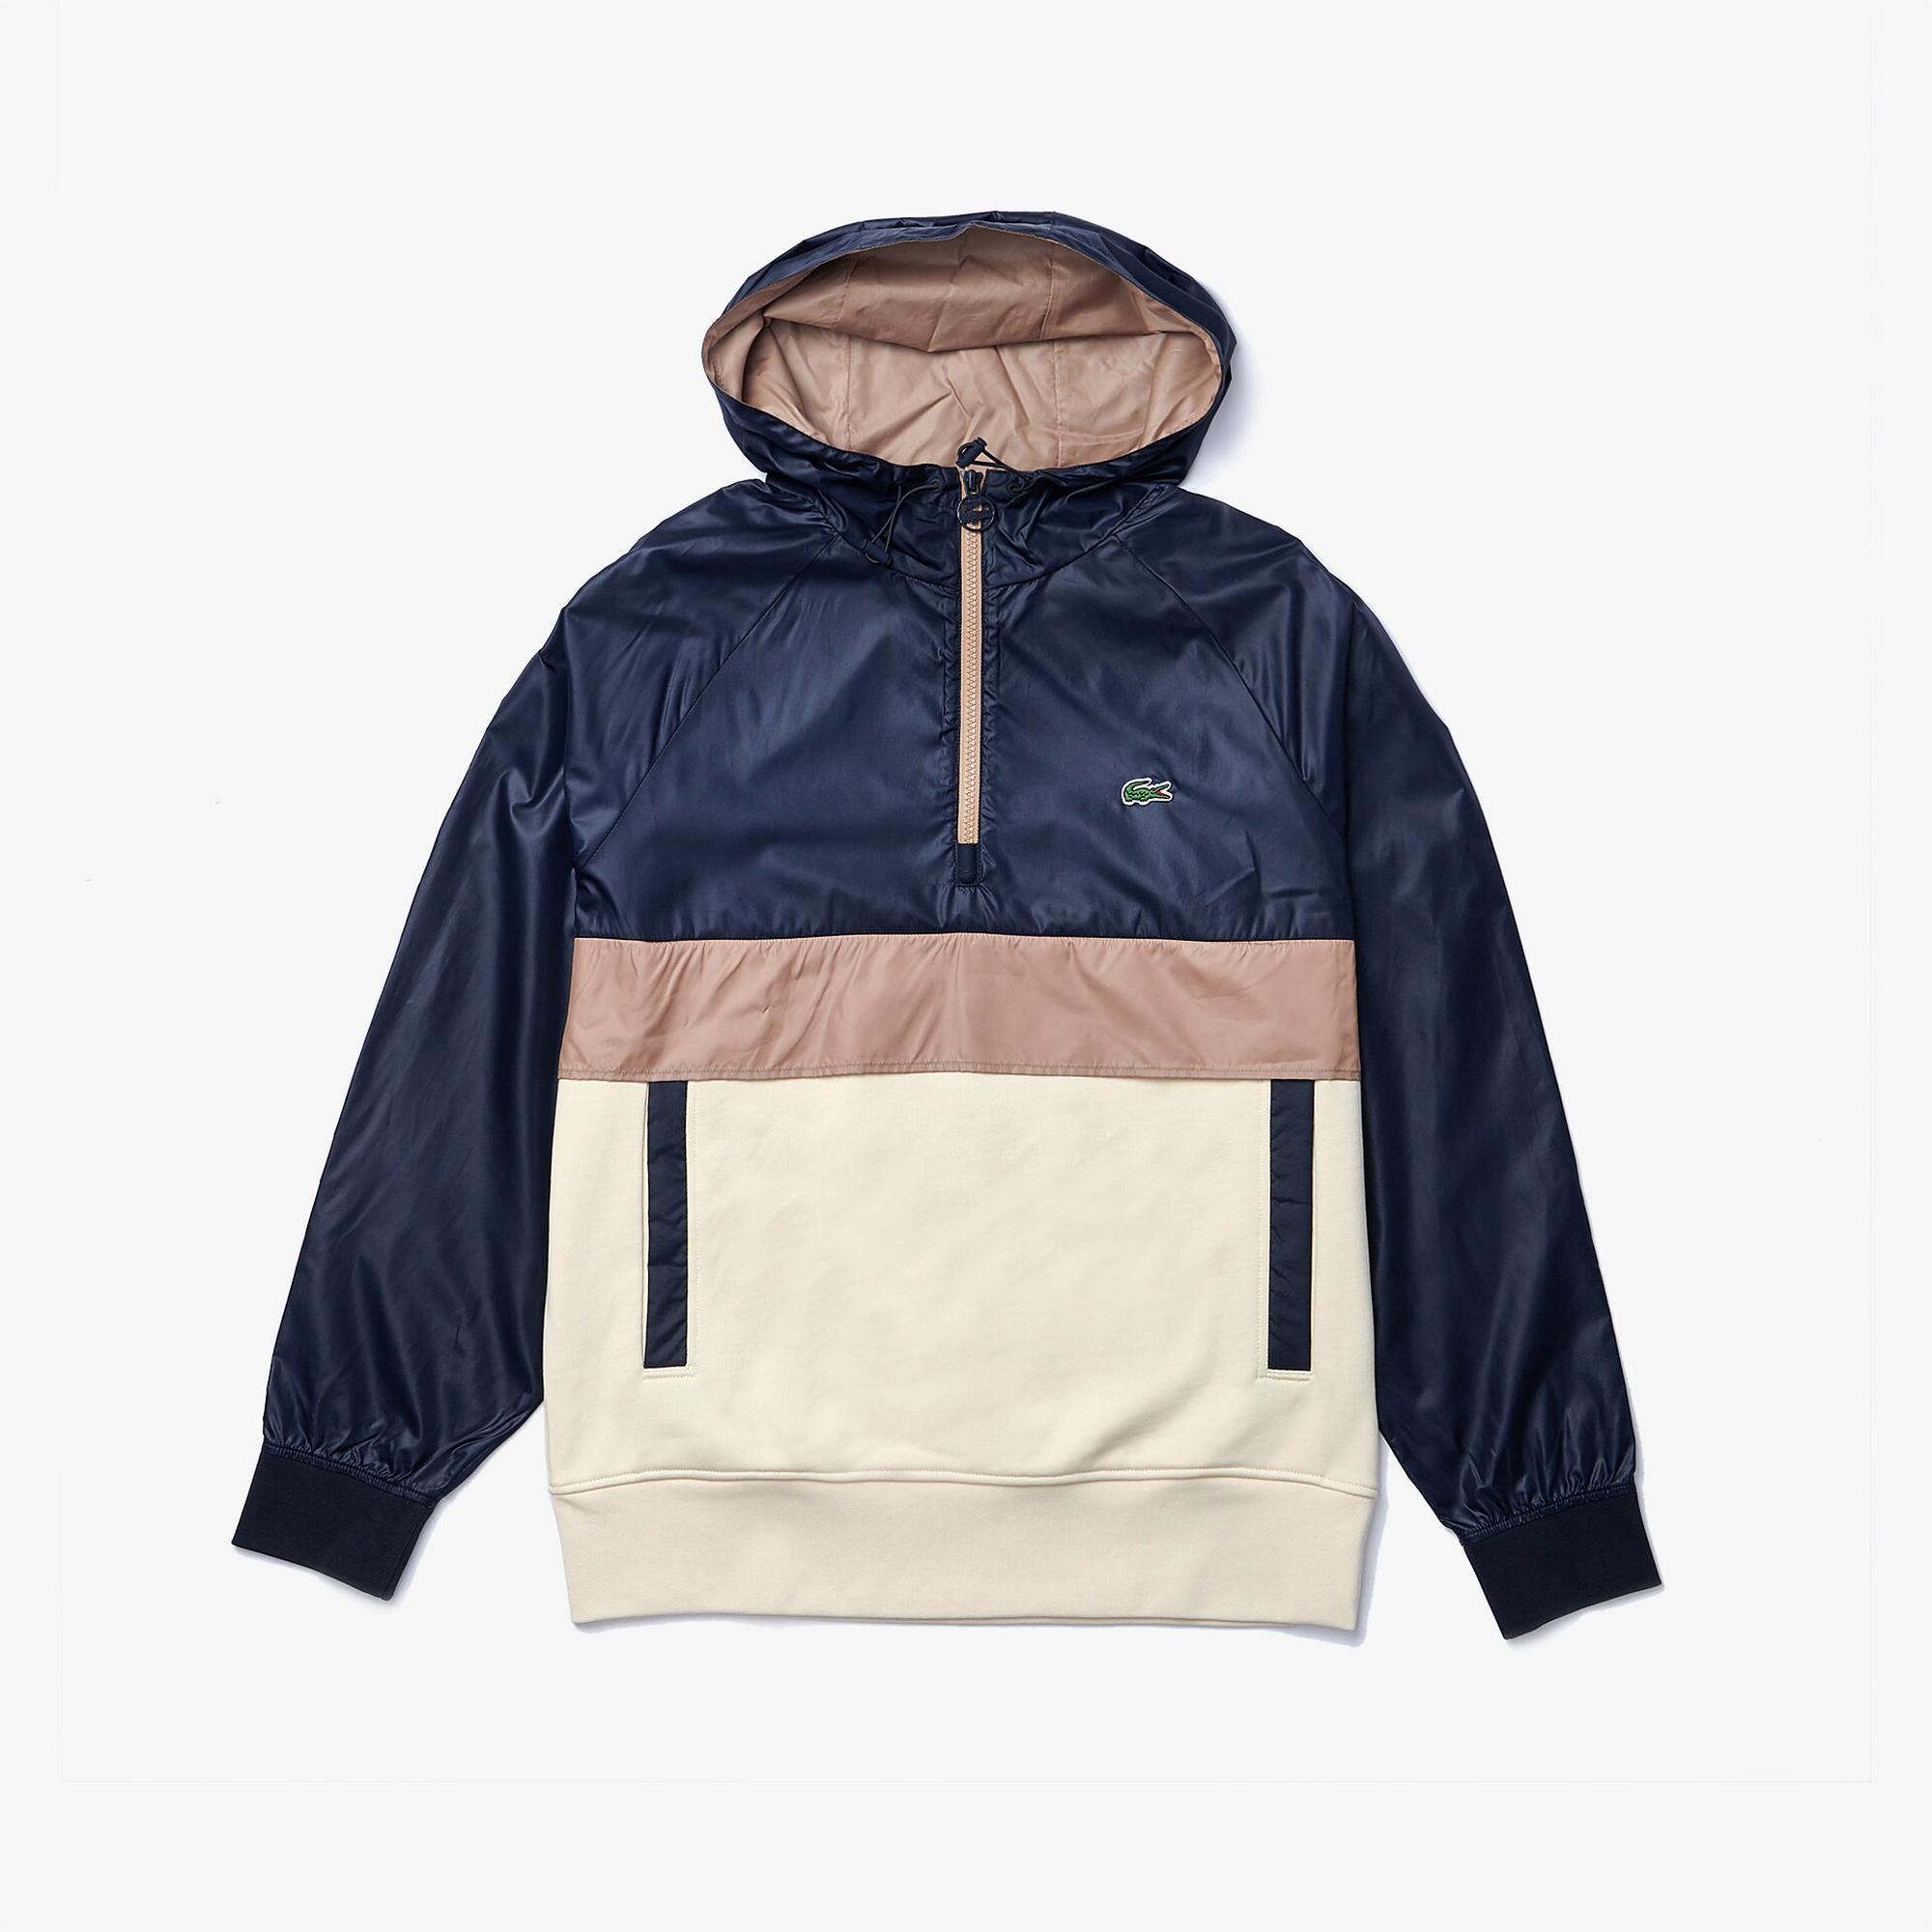 Lacoste Erkek Rahat Fit Kapüşonlu Renk Bloklu Renkli Sweatshirt